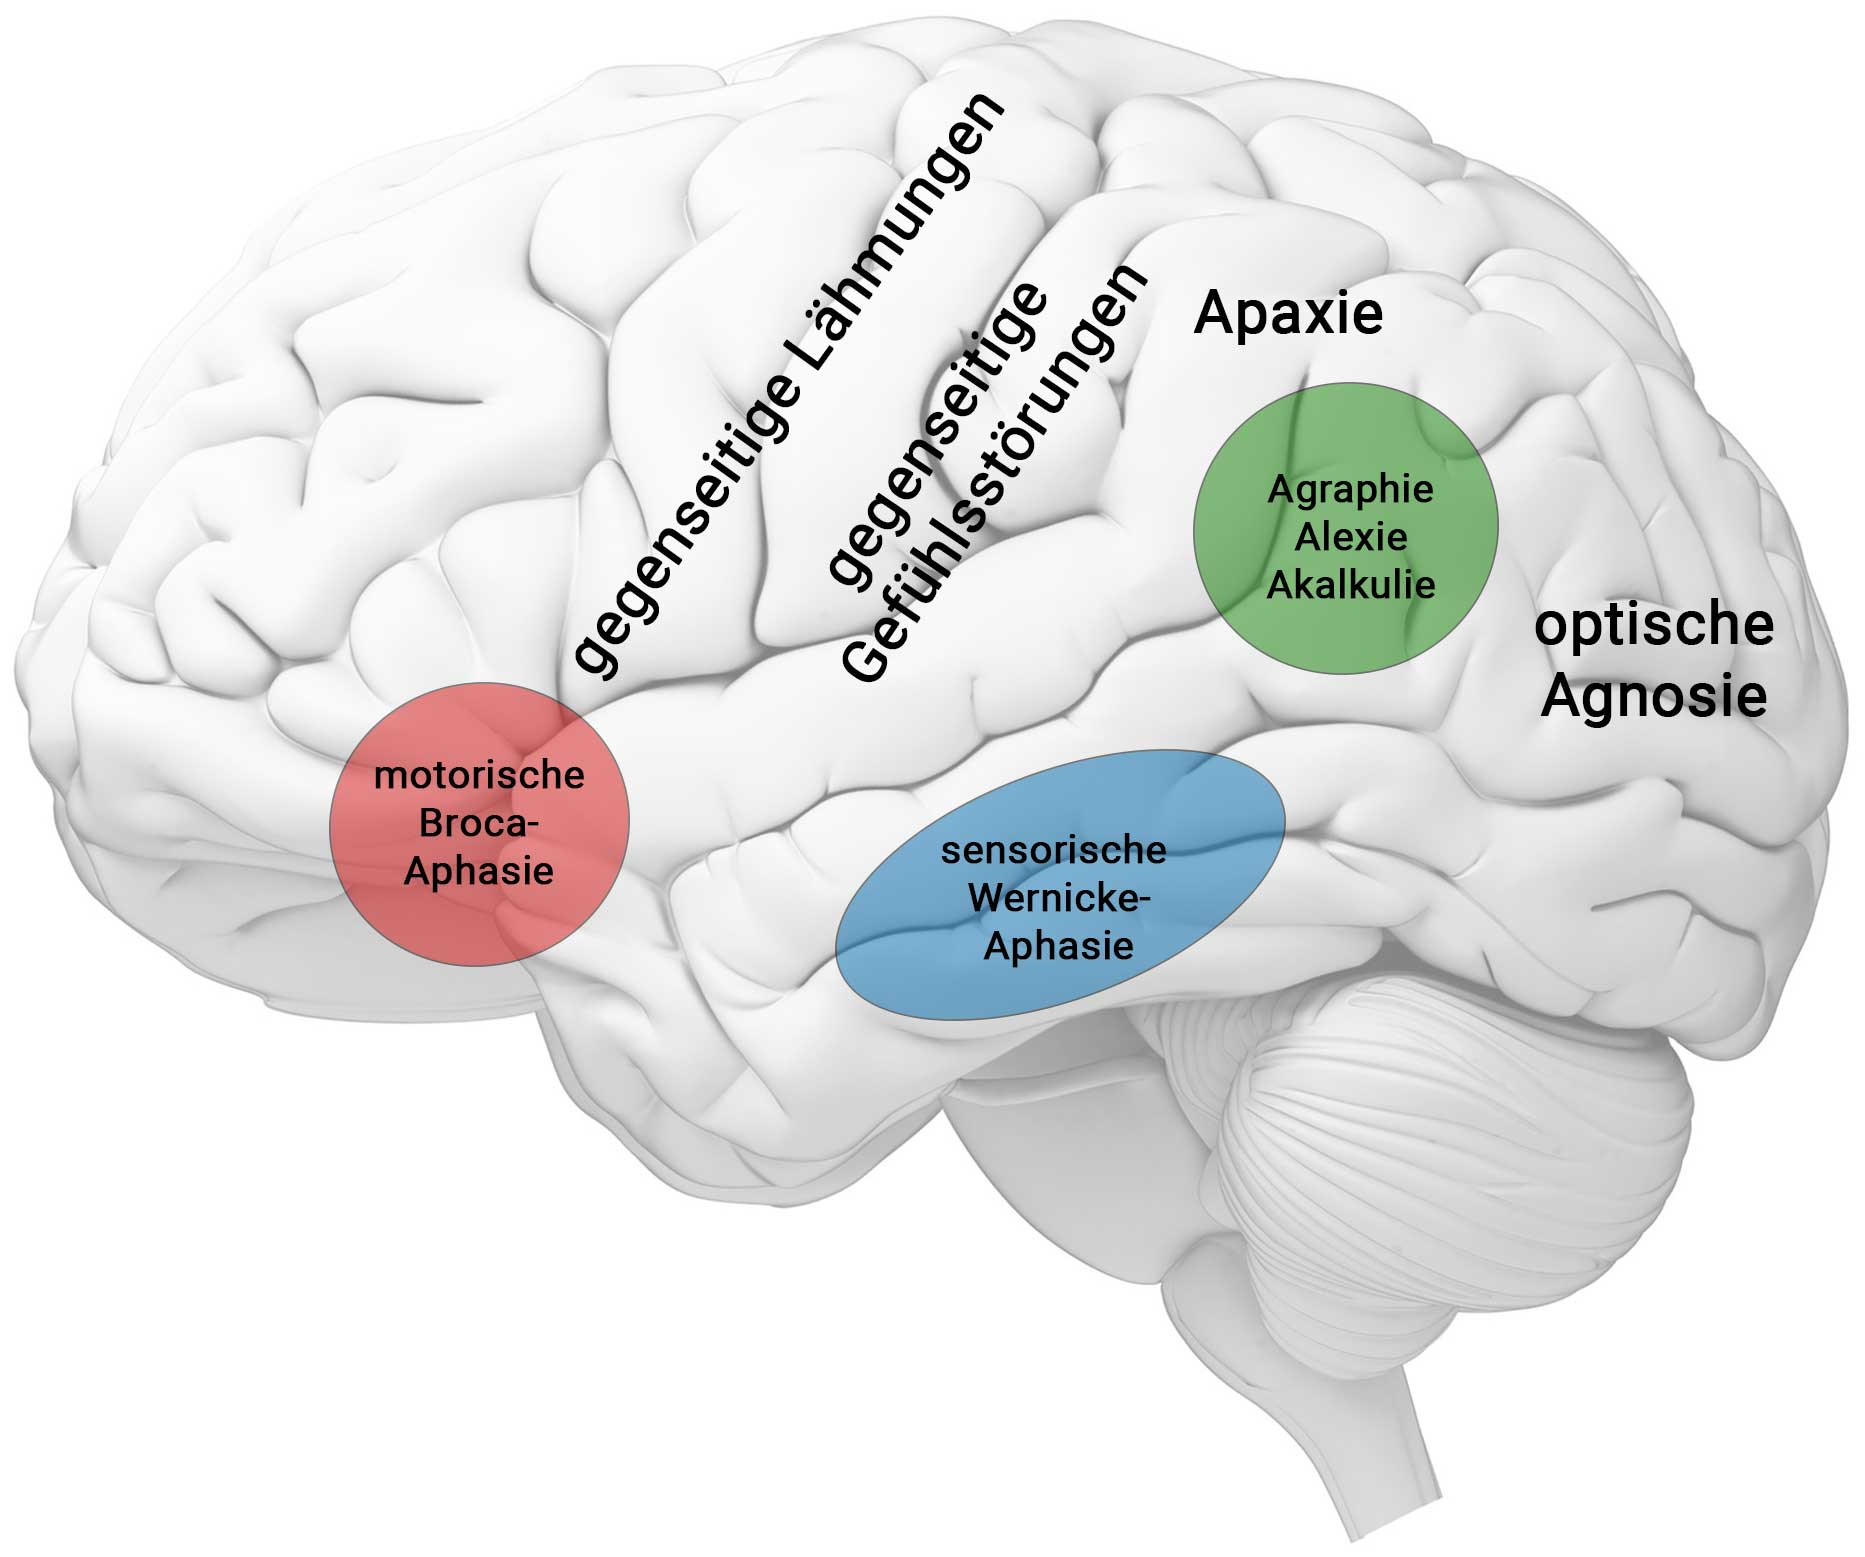 hirn neuropsychologische symptome